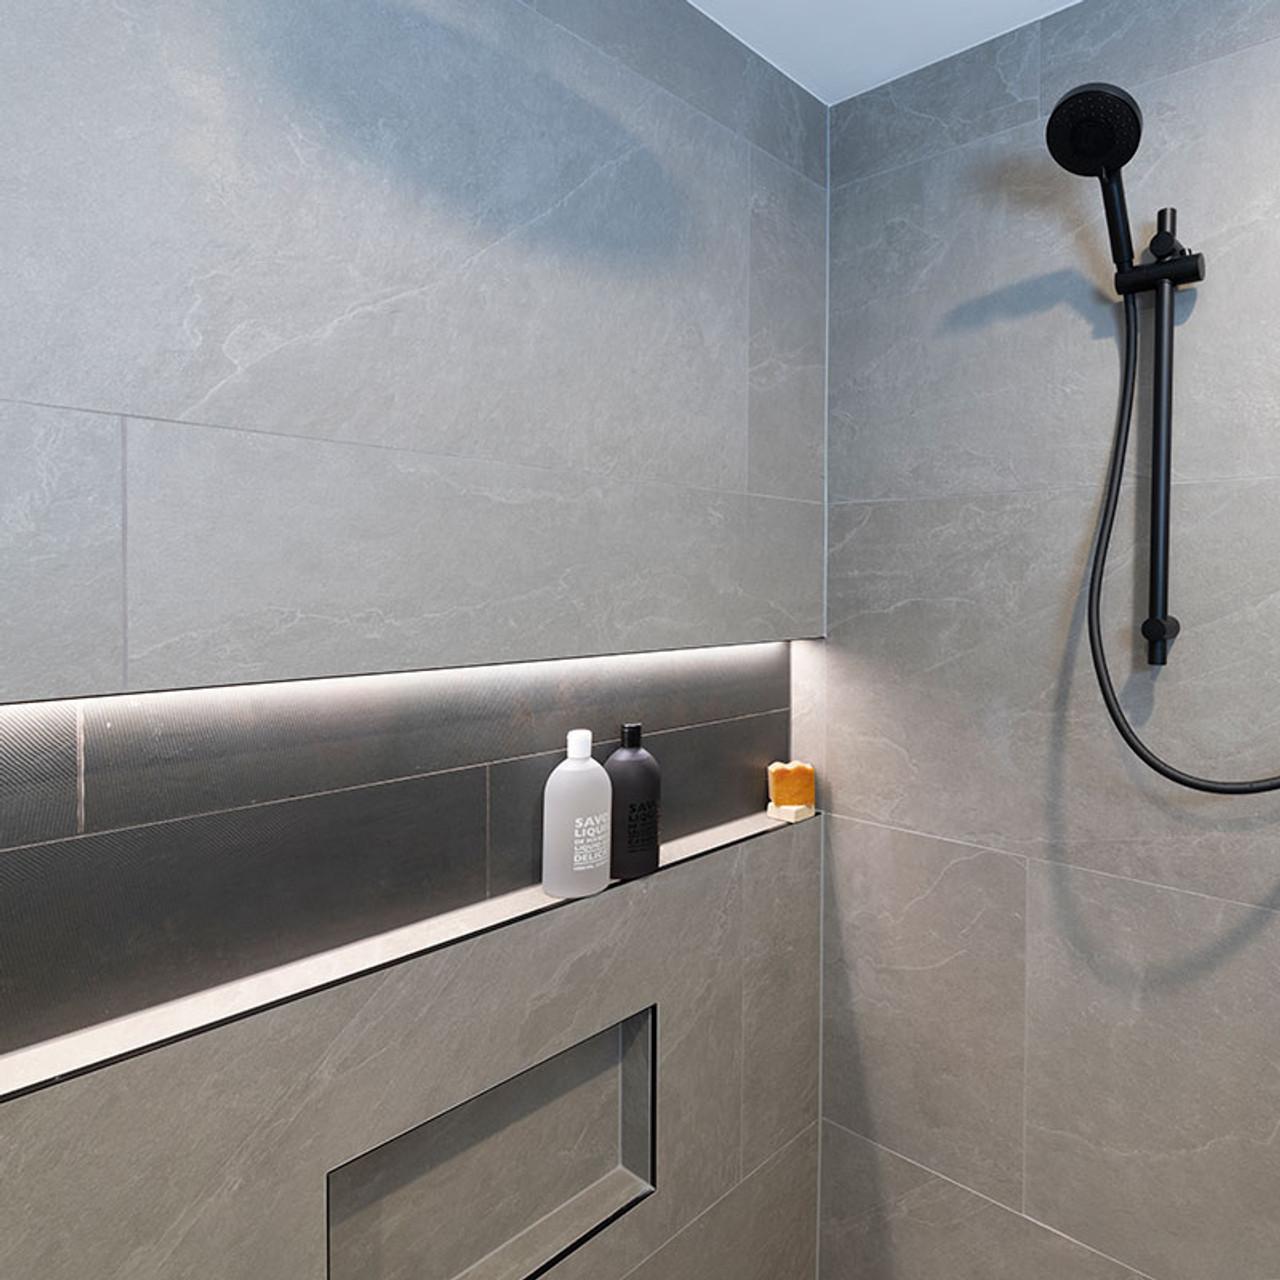 runa grigio scuro 60x120 tile space